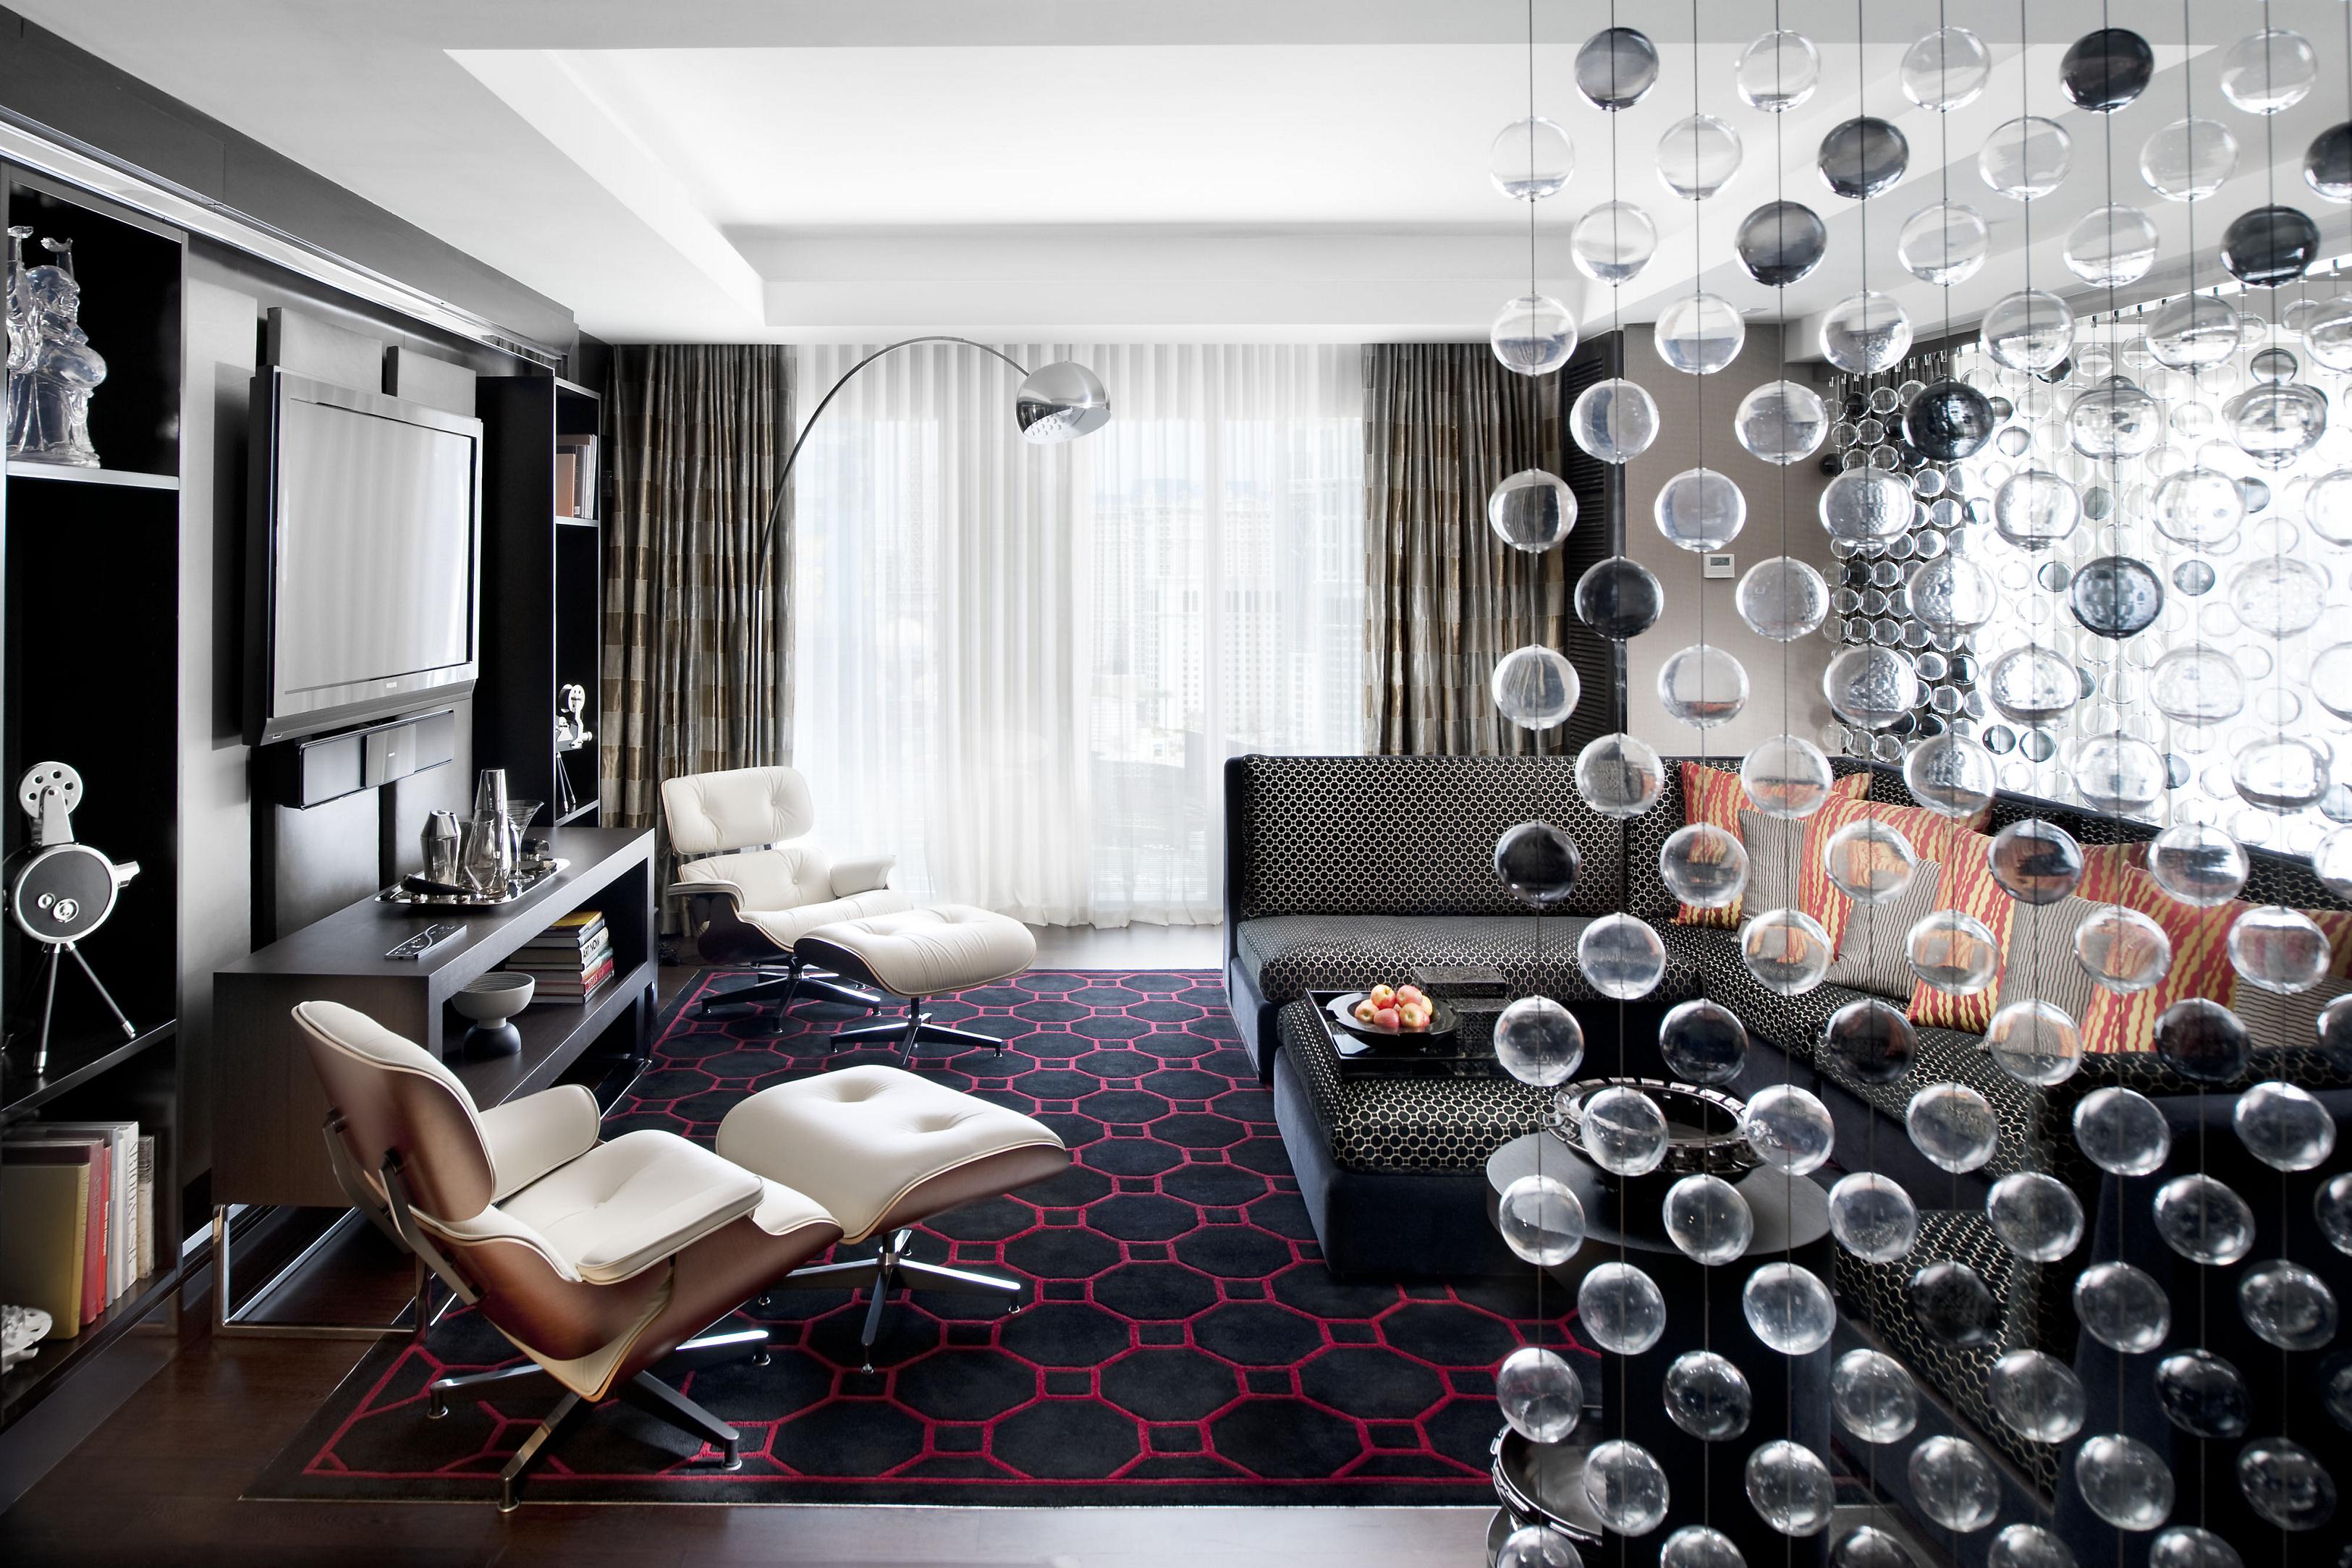 las-vegas-suite-emperor-suite-media-room-5